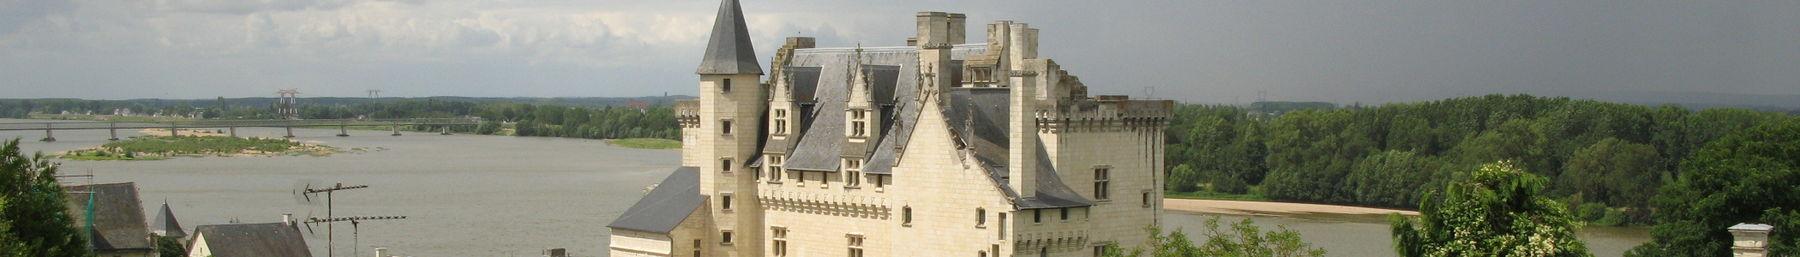 Montsoreau banner.jpg